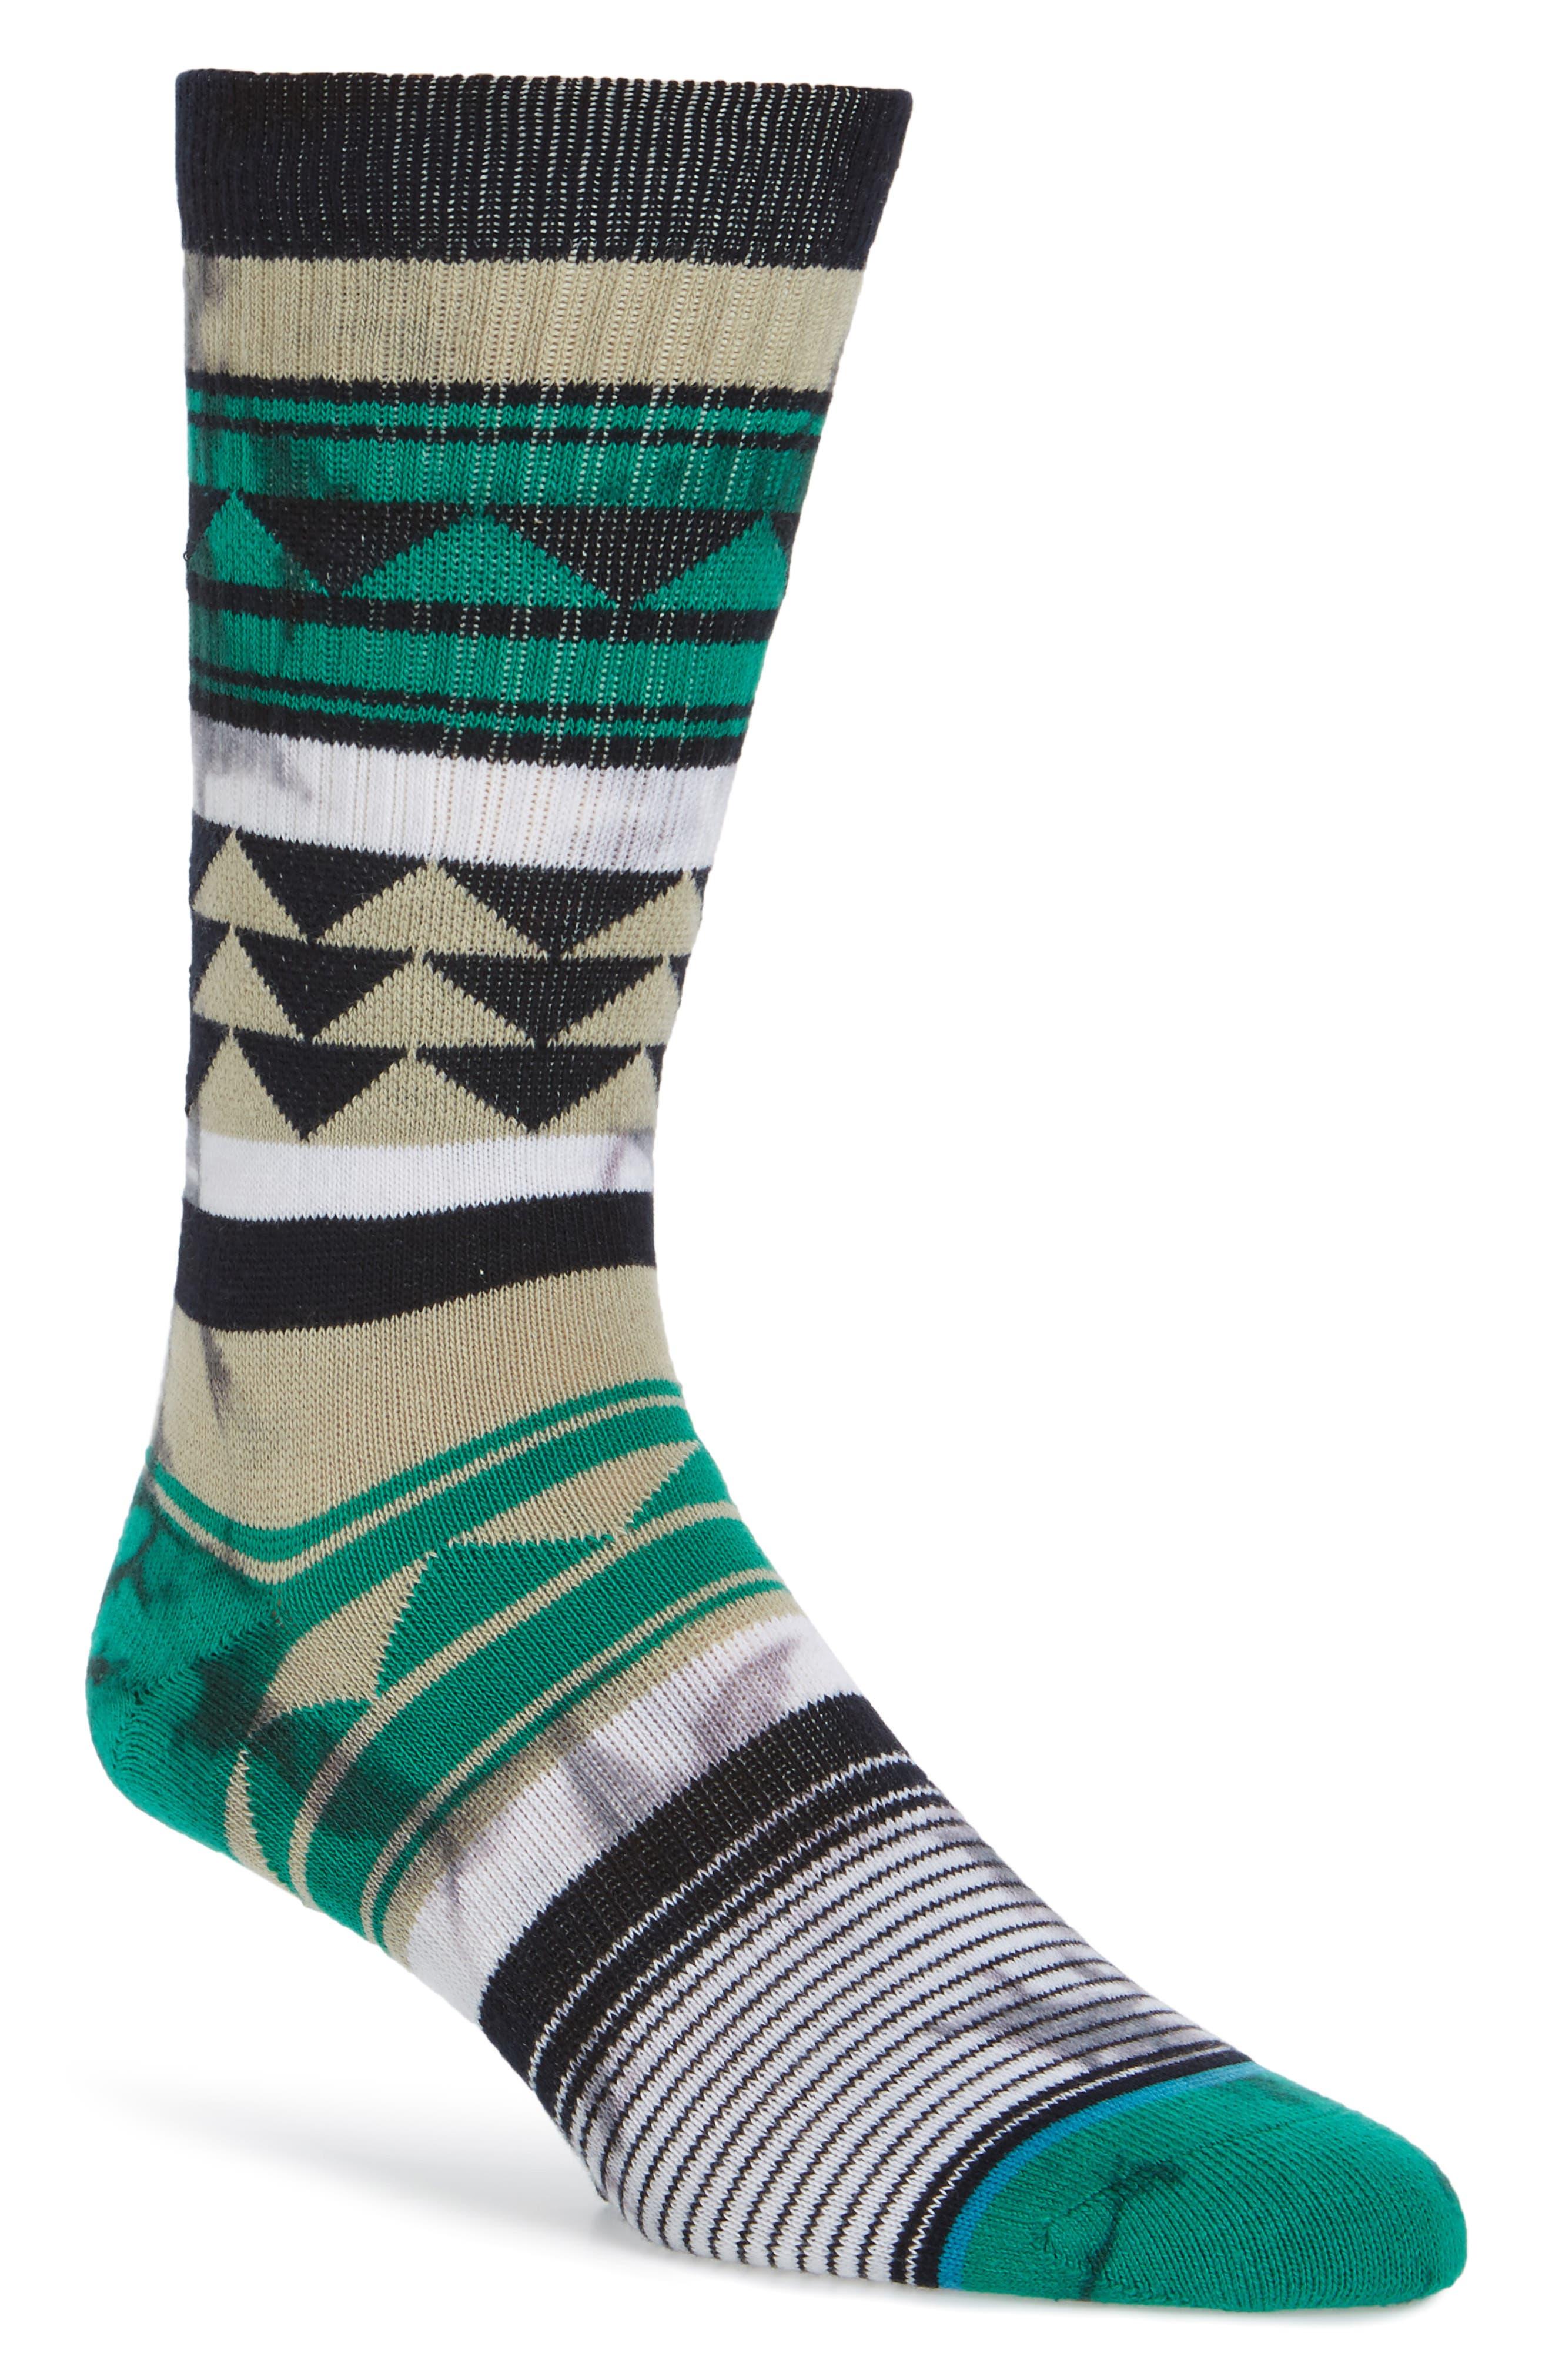 Main Image - Stance Pachuca Crew Socks